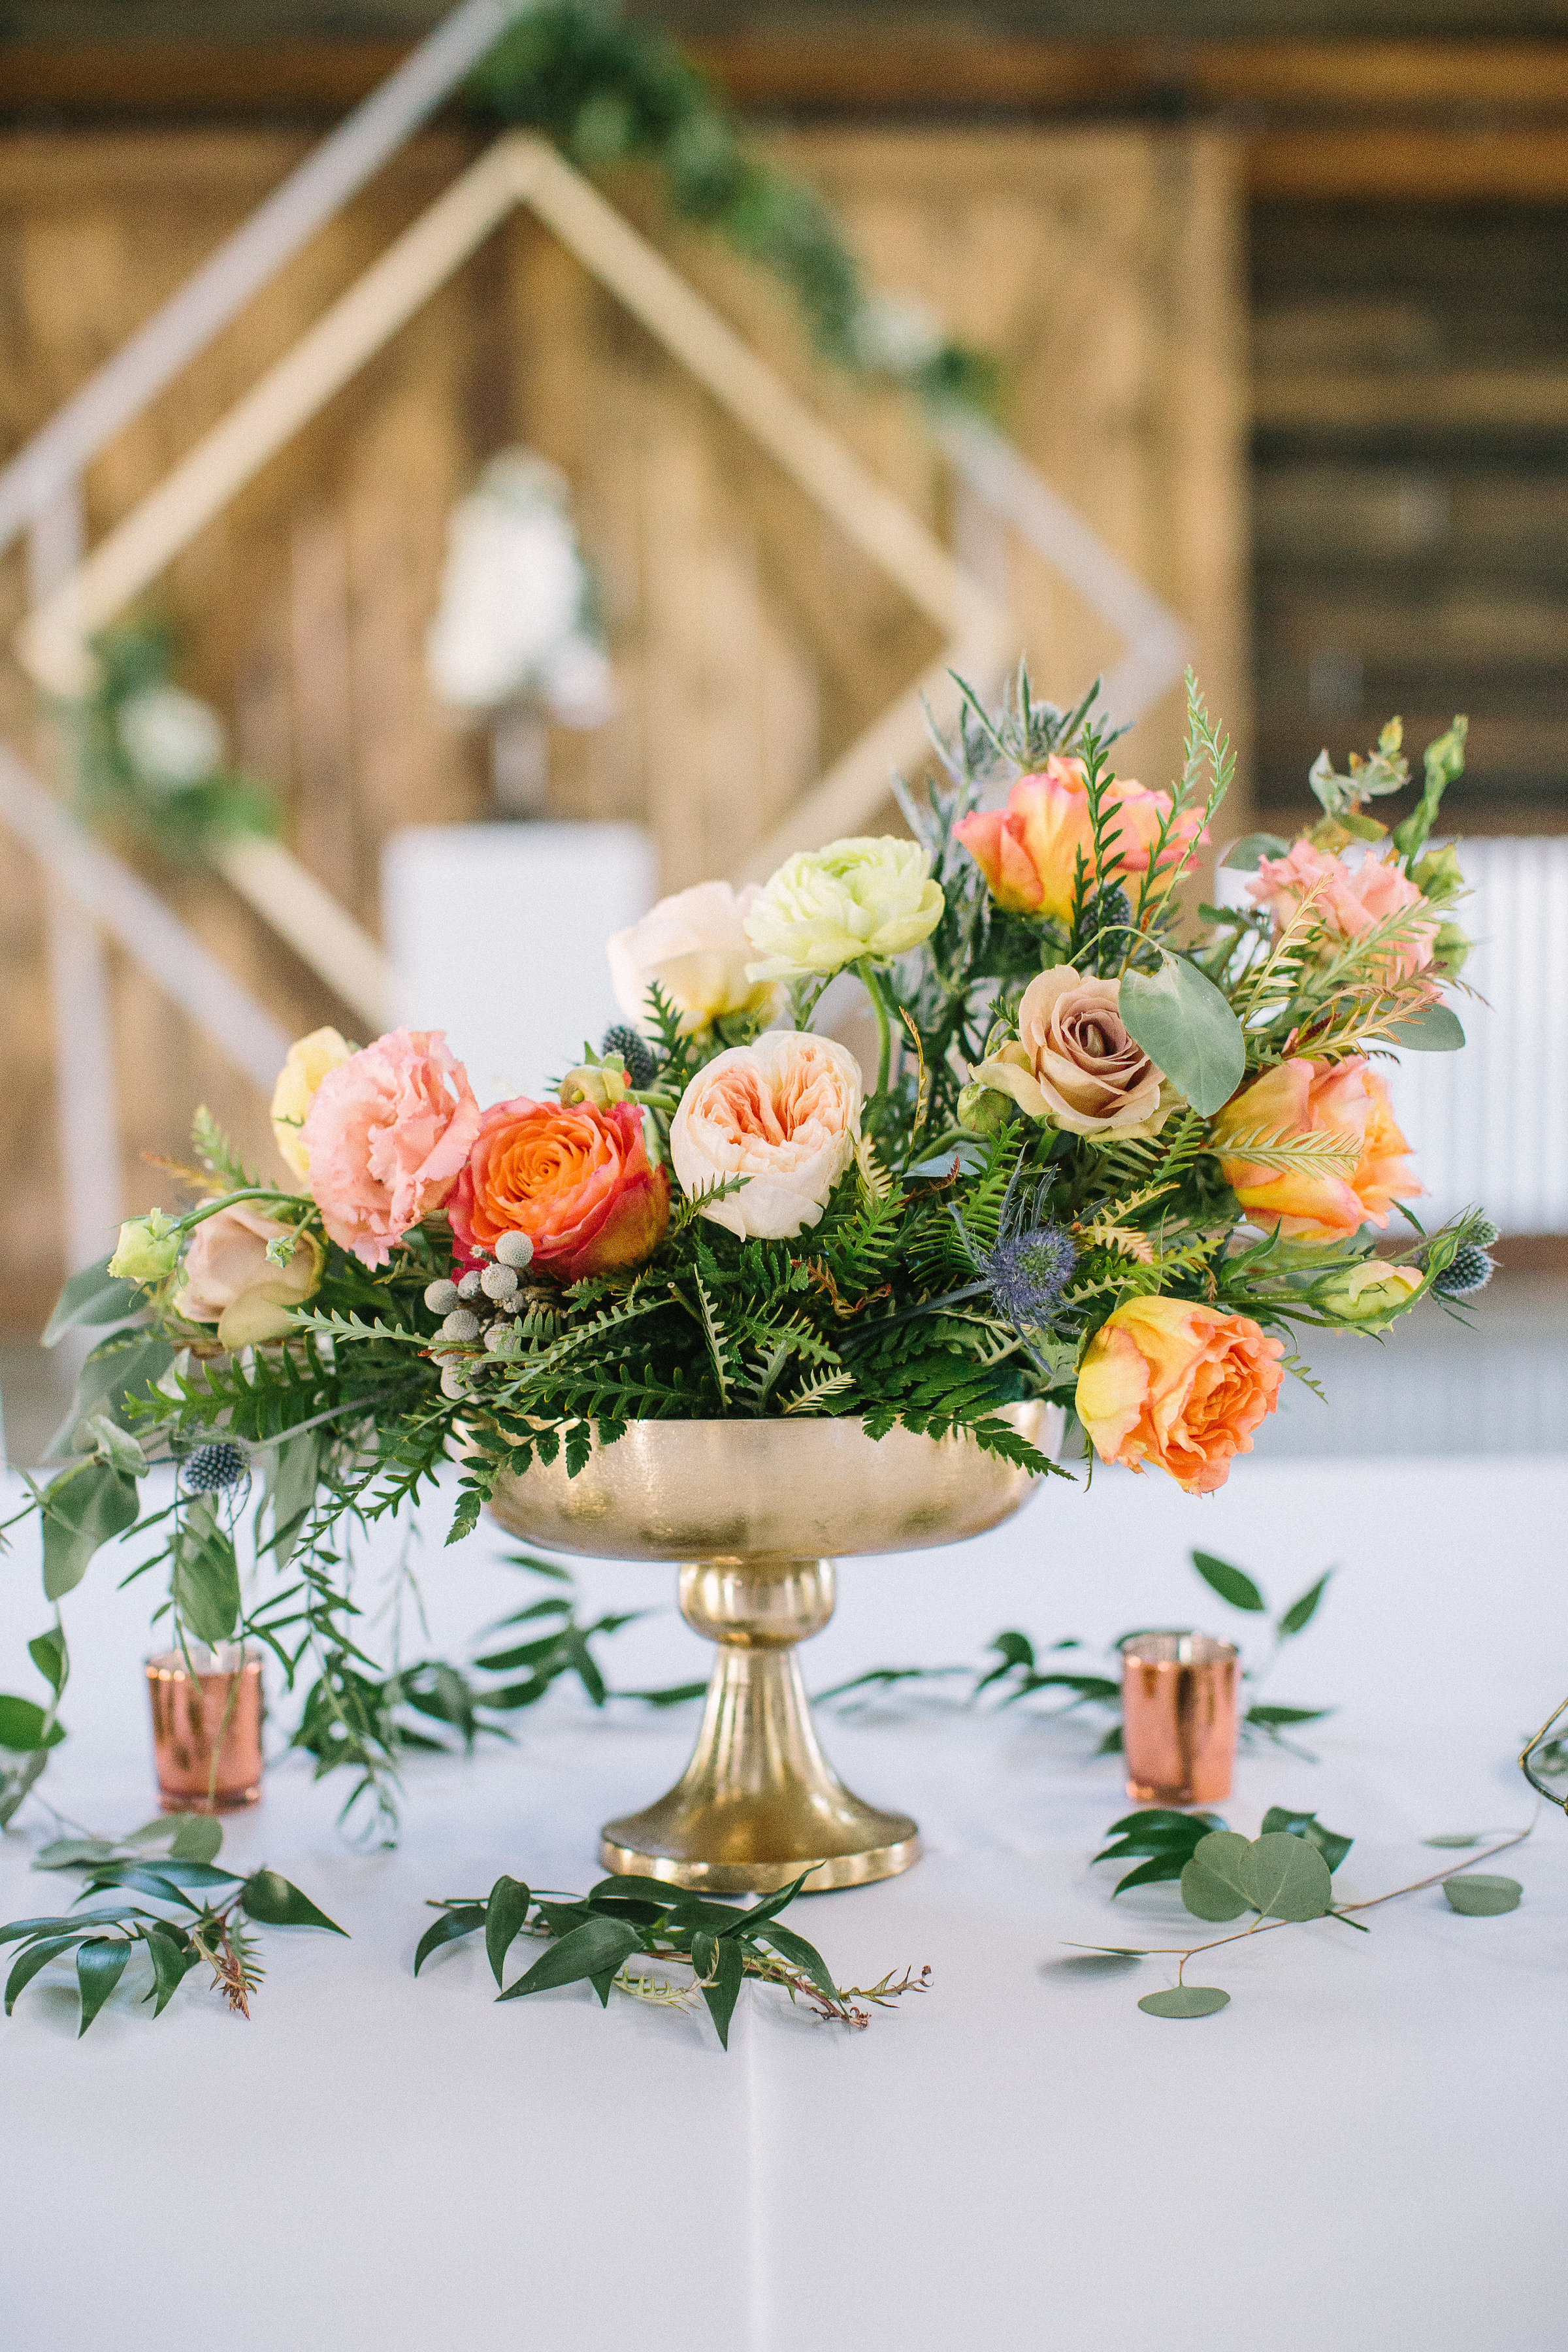 Ellen-Ashton-Photography-Peach-Creek-Ranch-Weddings-Wed-and-Prosper78